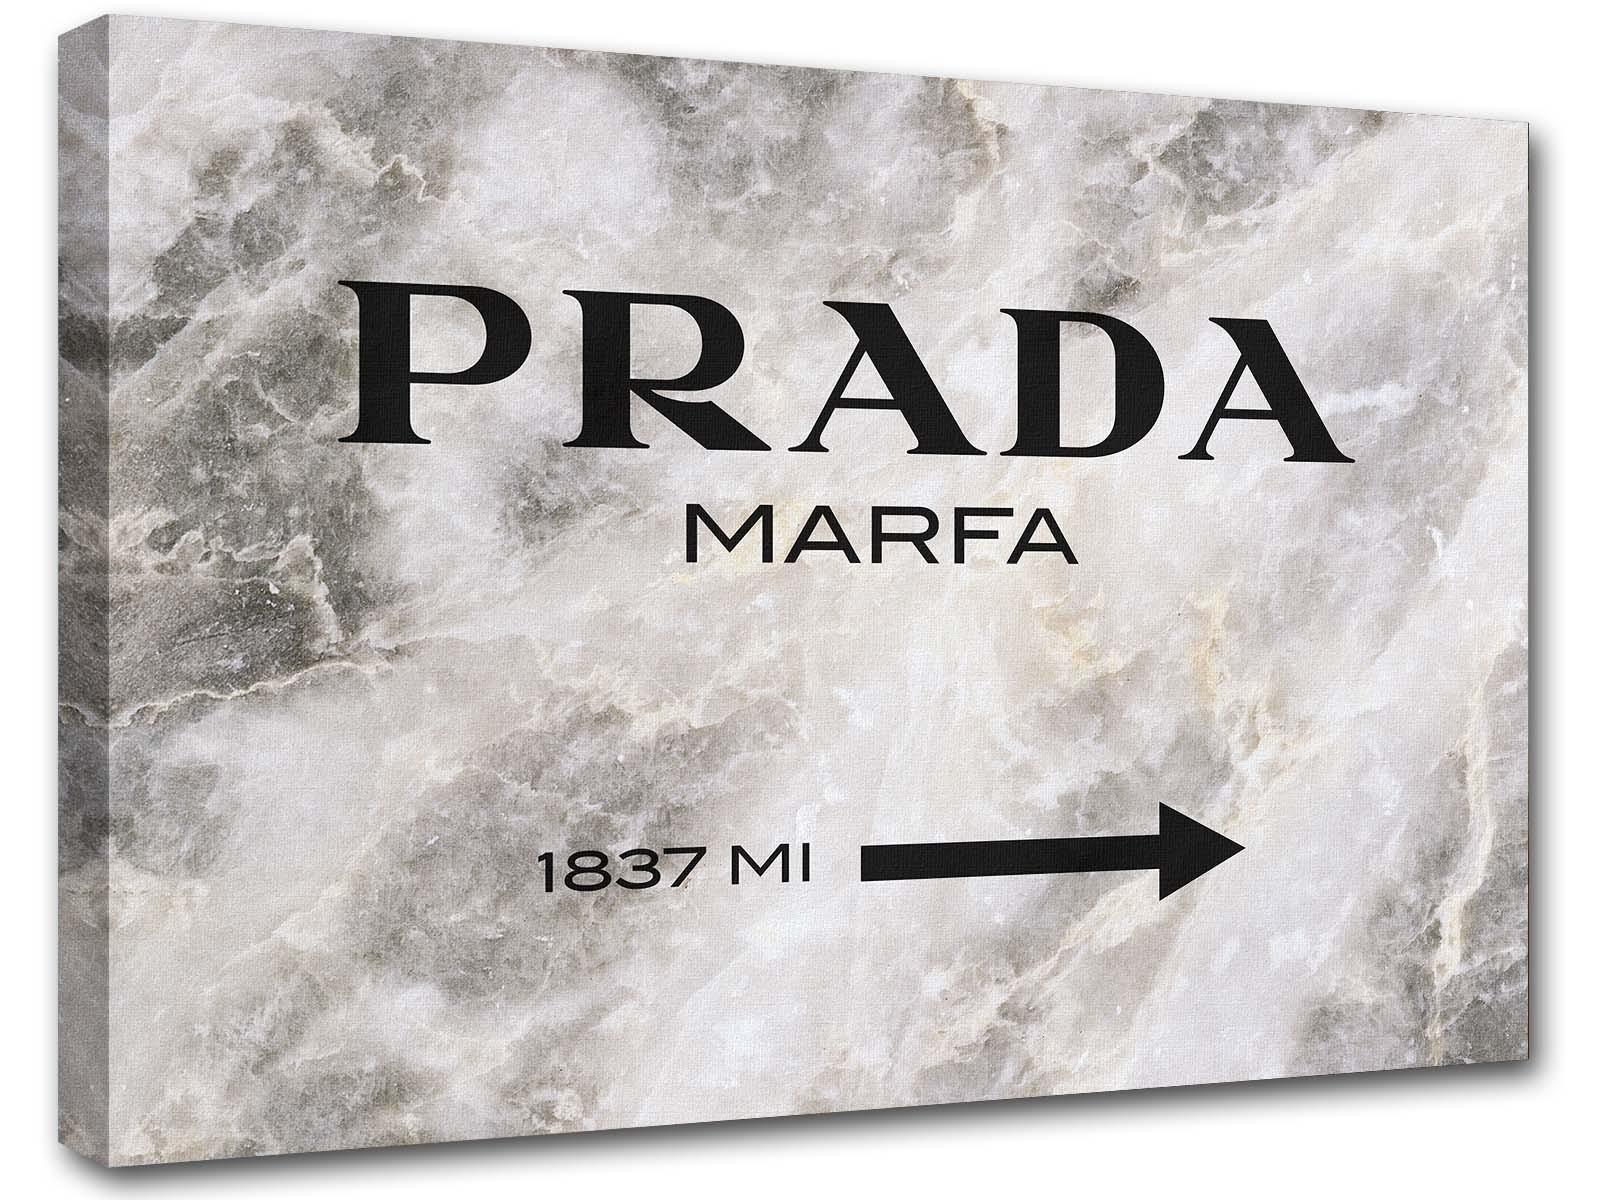 Prada – Kuader Regarding Prada Marfa Wall Art (Image 13 of 20)